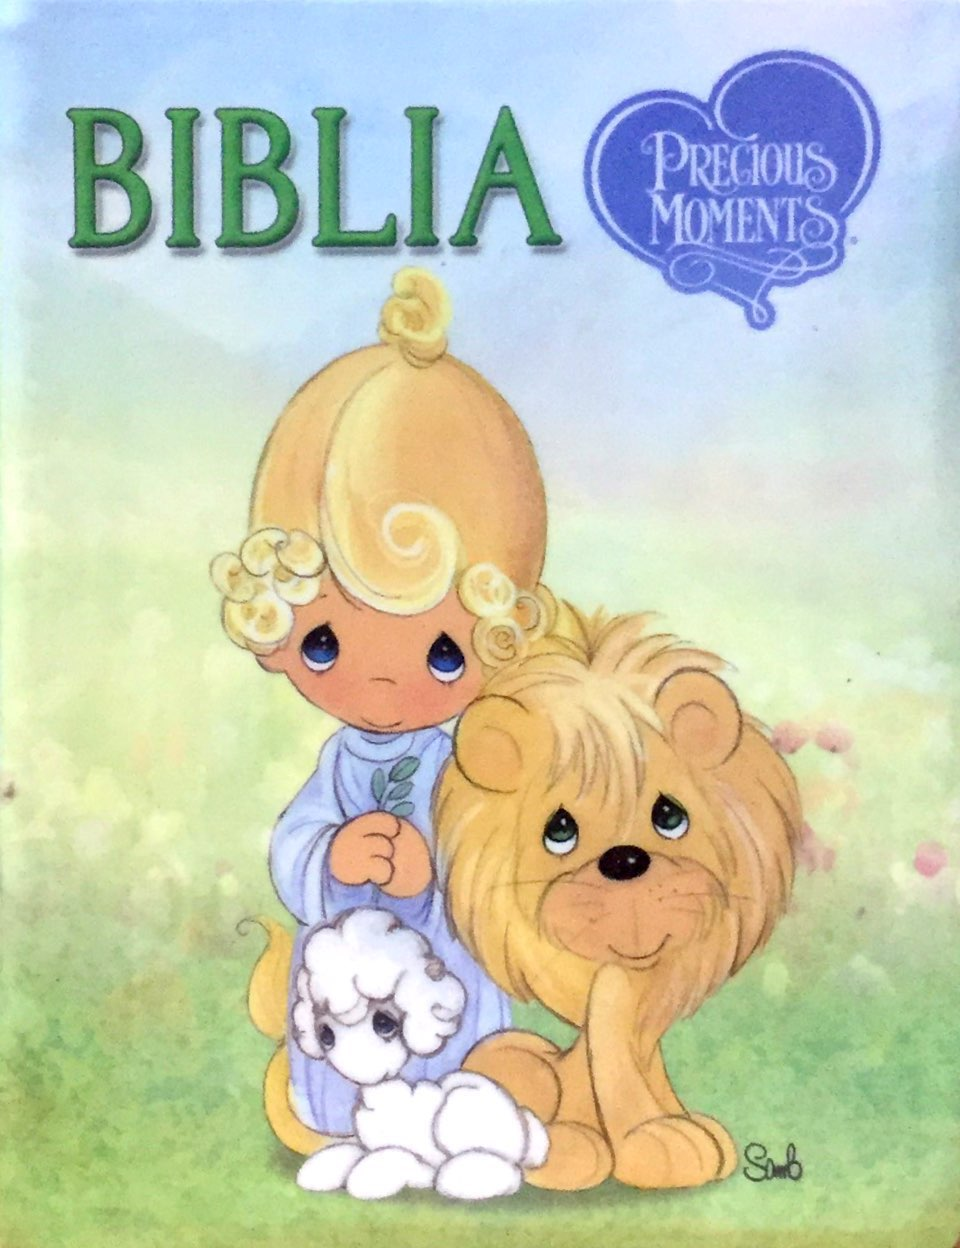 Biblia Precious Moments / Reina Valera 1960 / tama�o bolsillo / tapa vinil>